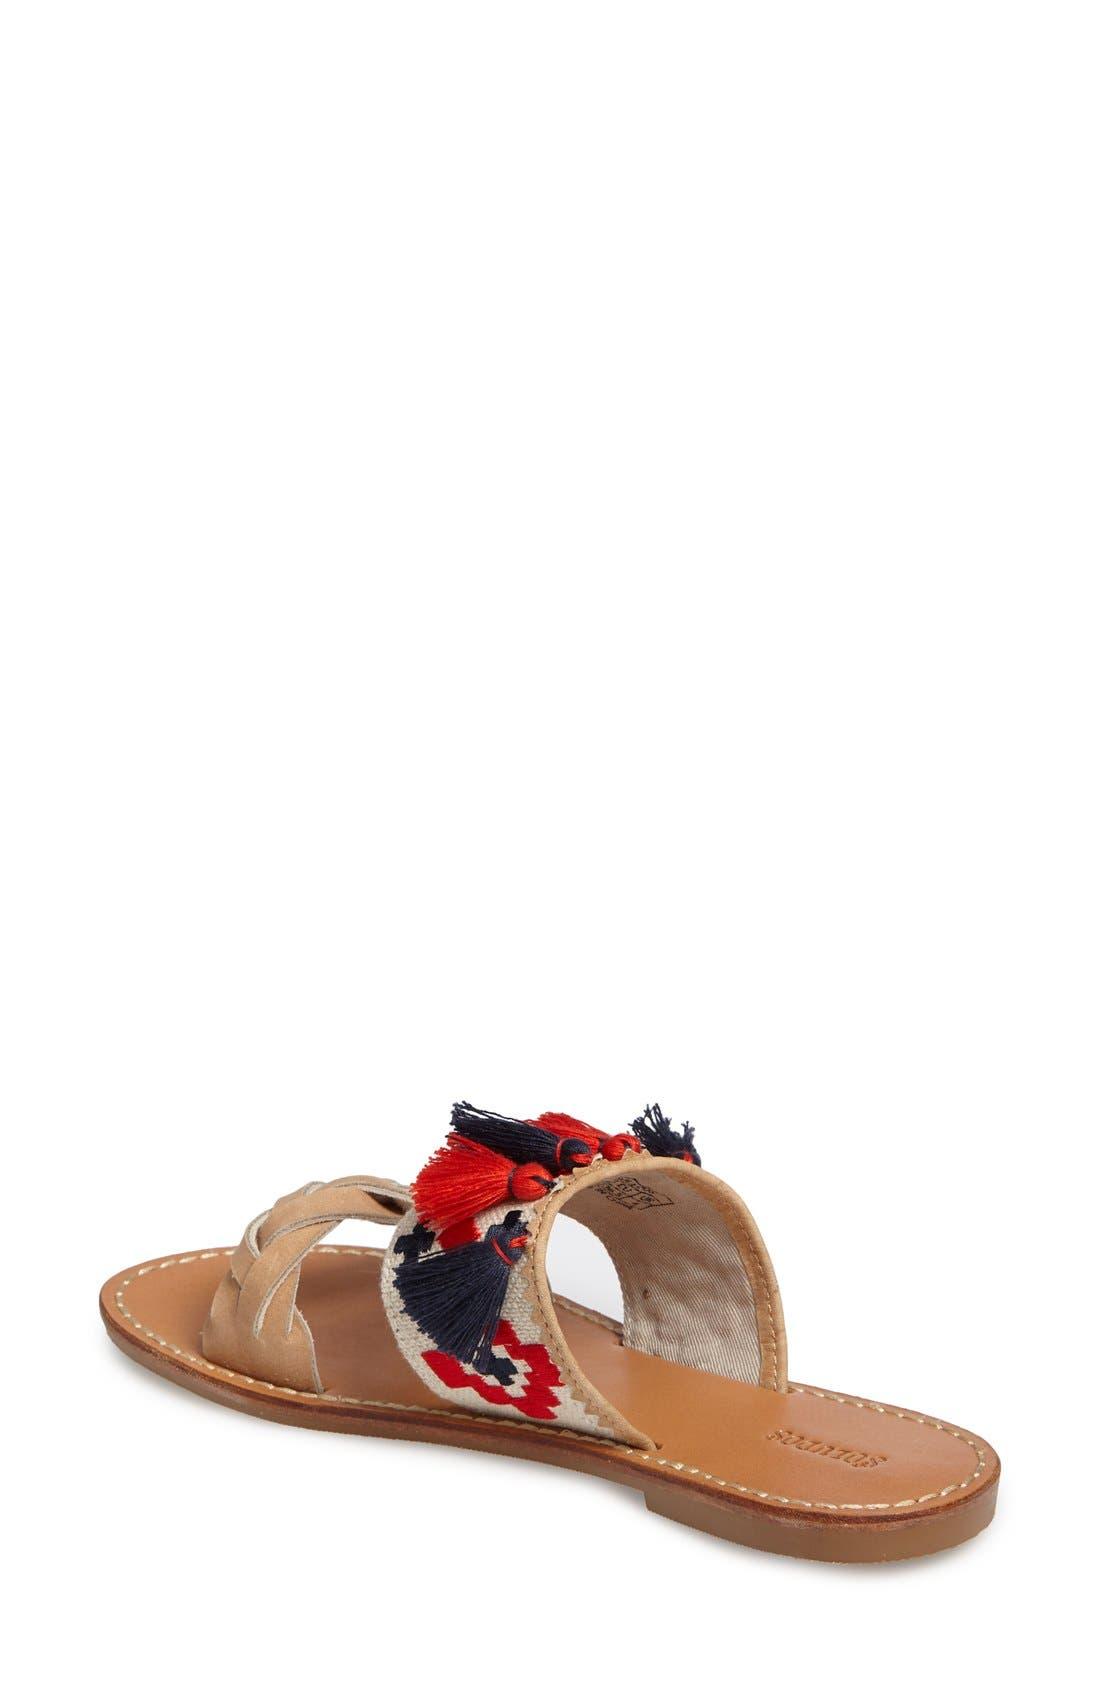 Alternate Image 2  - Soludus Embroidered Slide Sandal (Women)